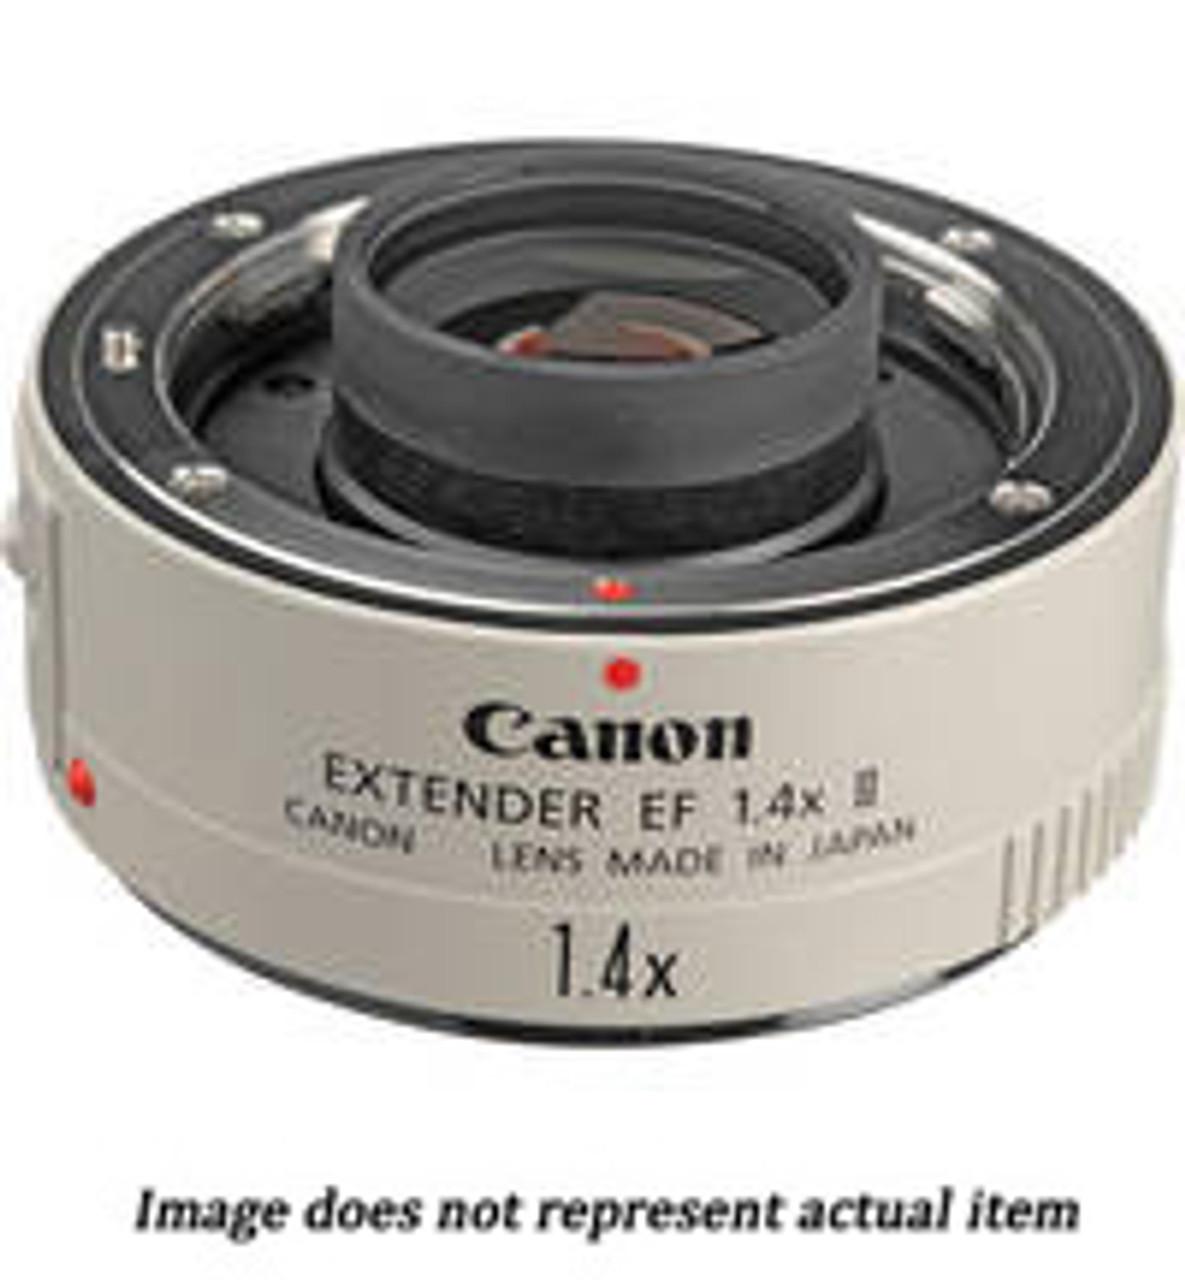 Canon EF 1.4x Extender II (Teleconverter) (USED) - S/N 11355